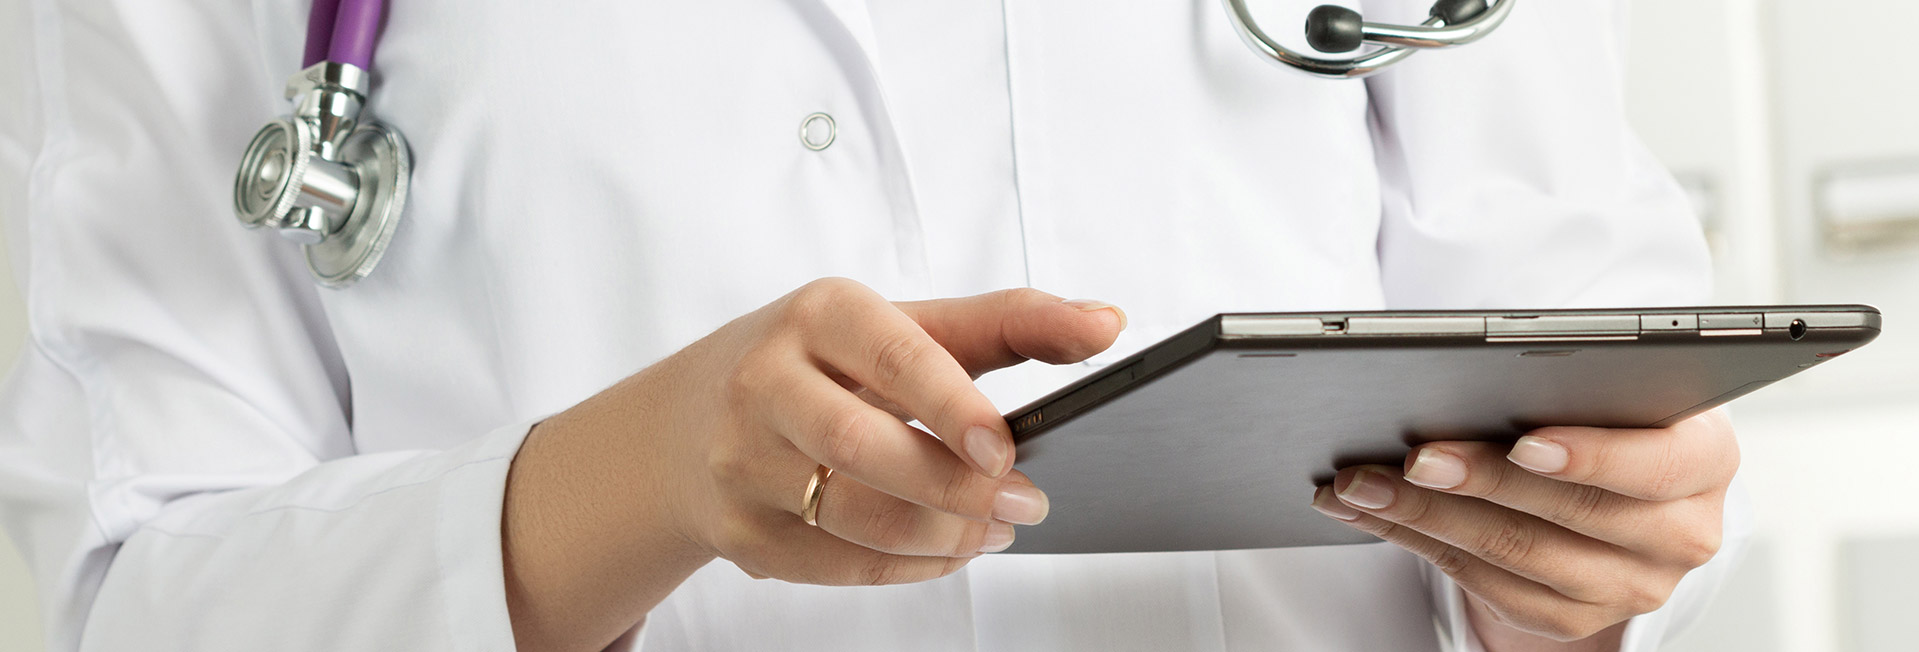 Retyina Labs Resources on Diabetic Retinopathy Screening